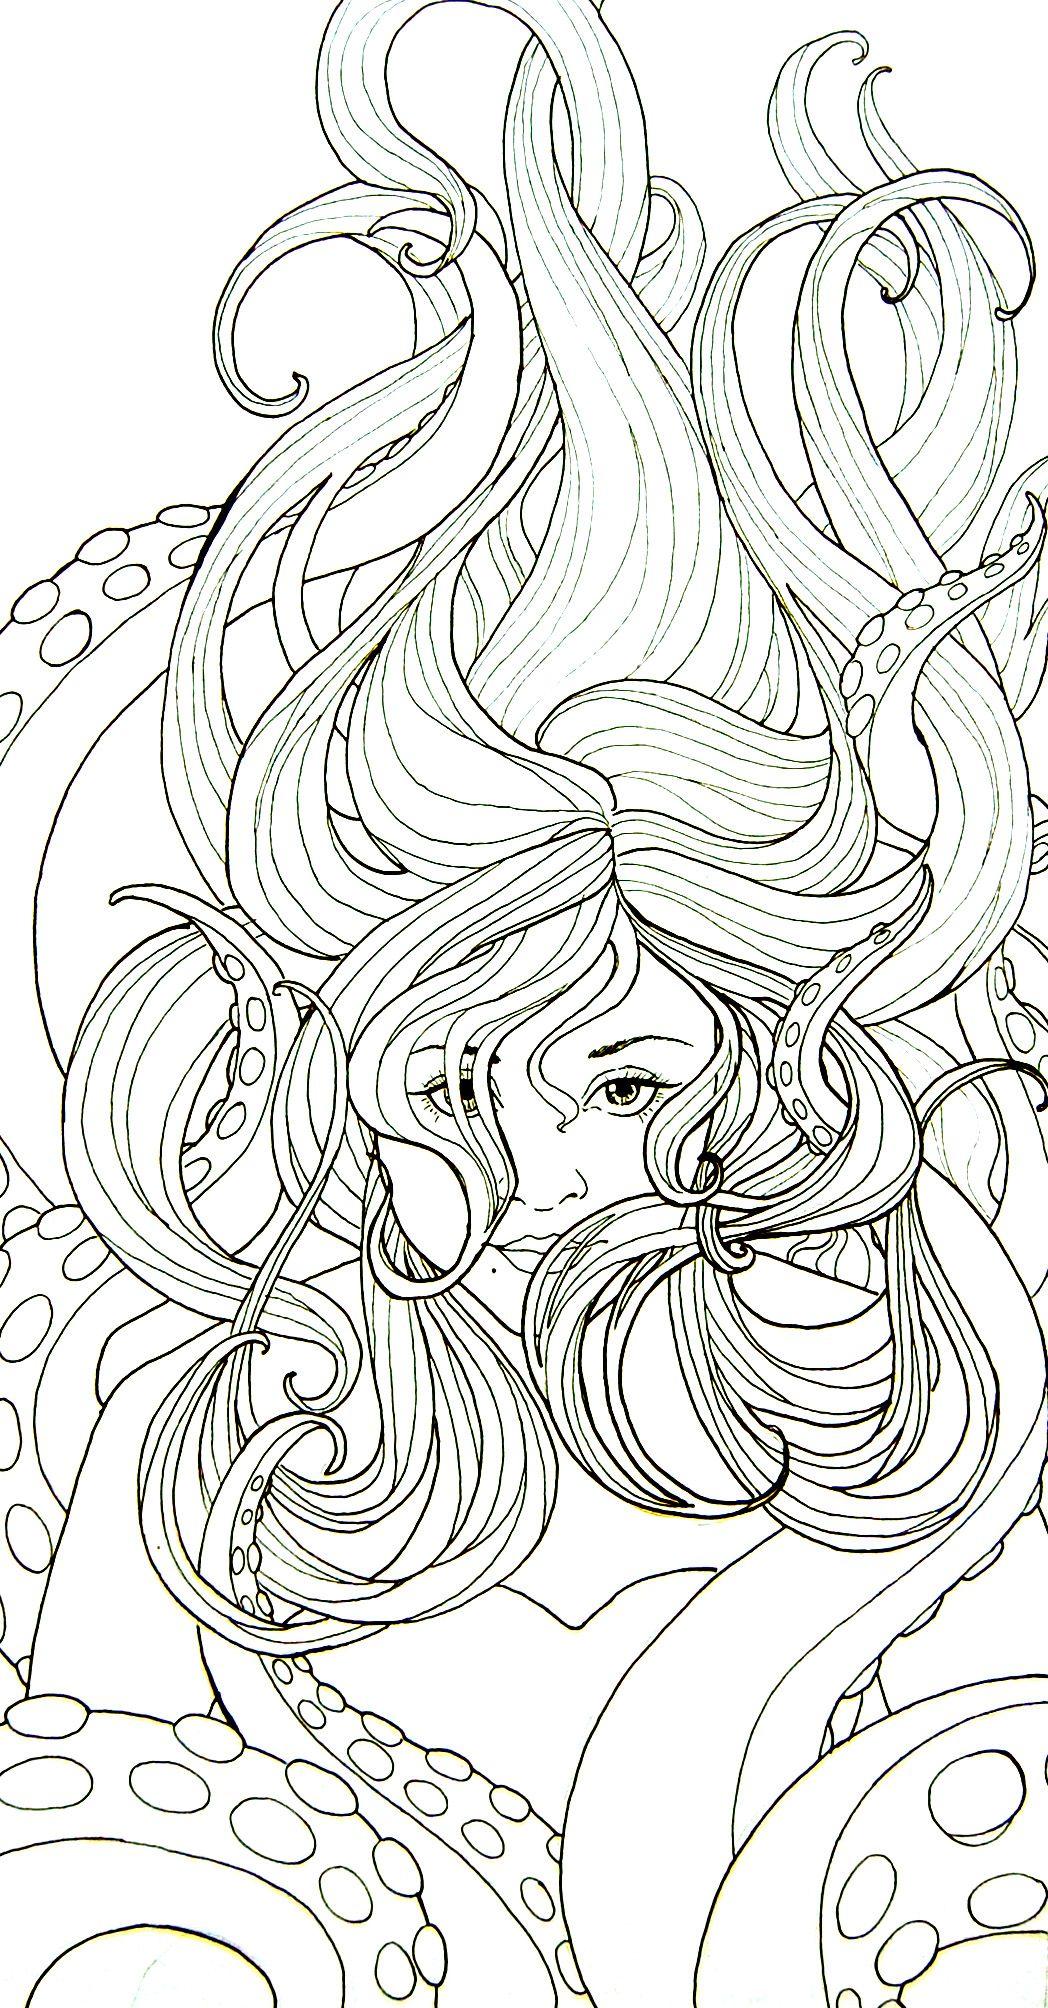 ursula_by_lamorien-d41asej.jpg (1048×2008) | dd | Pinterest